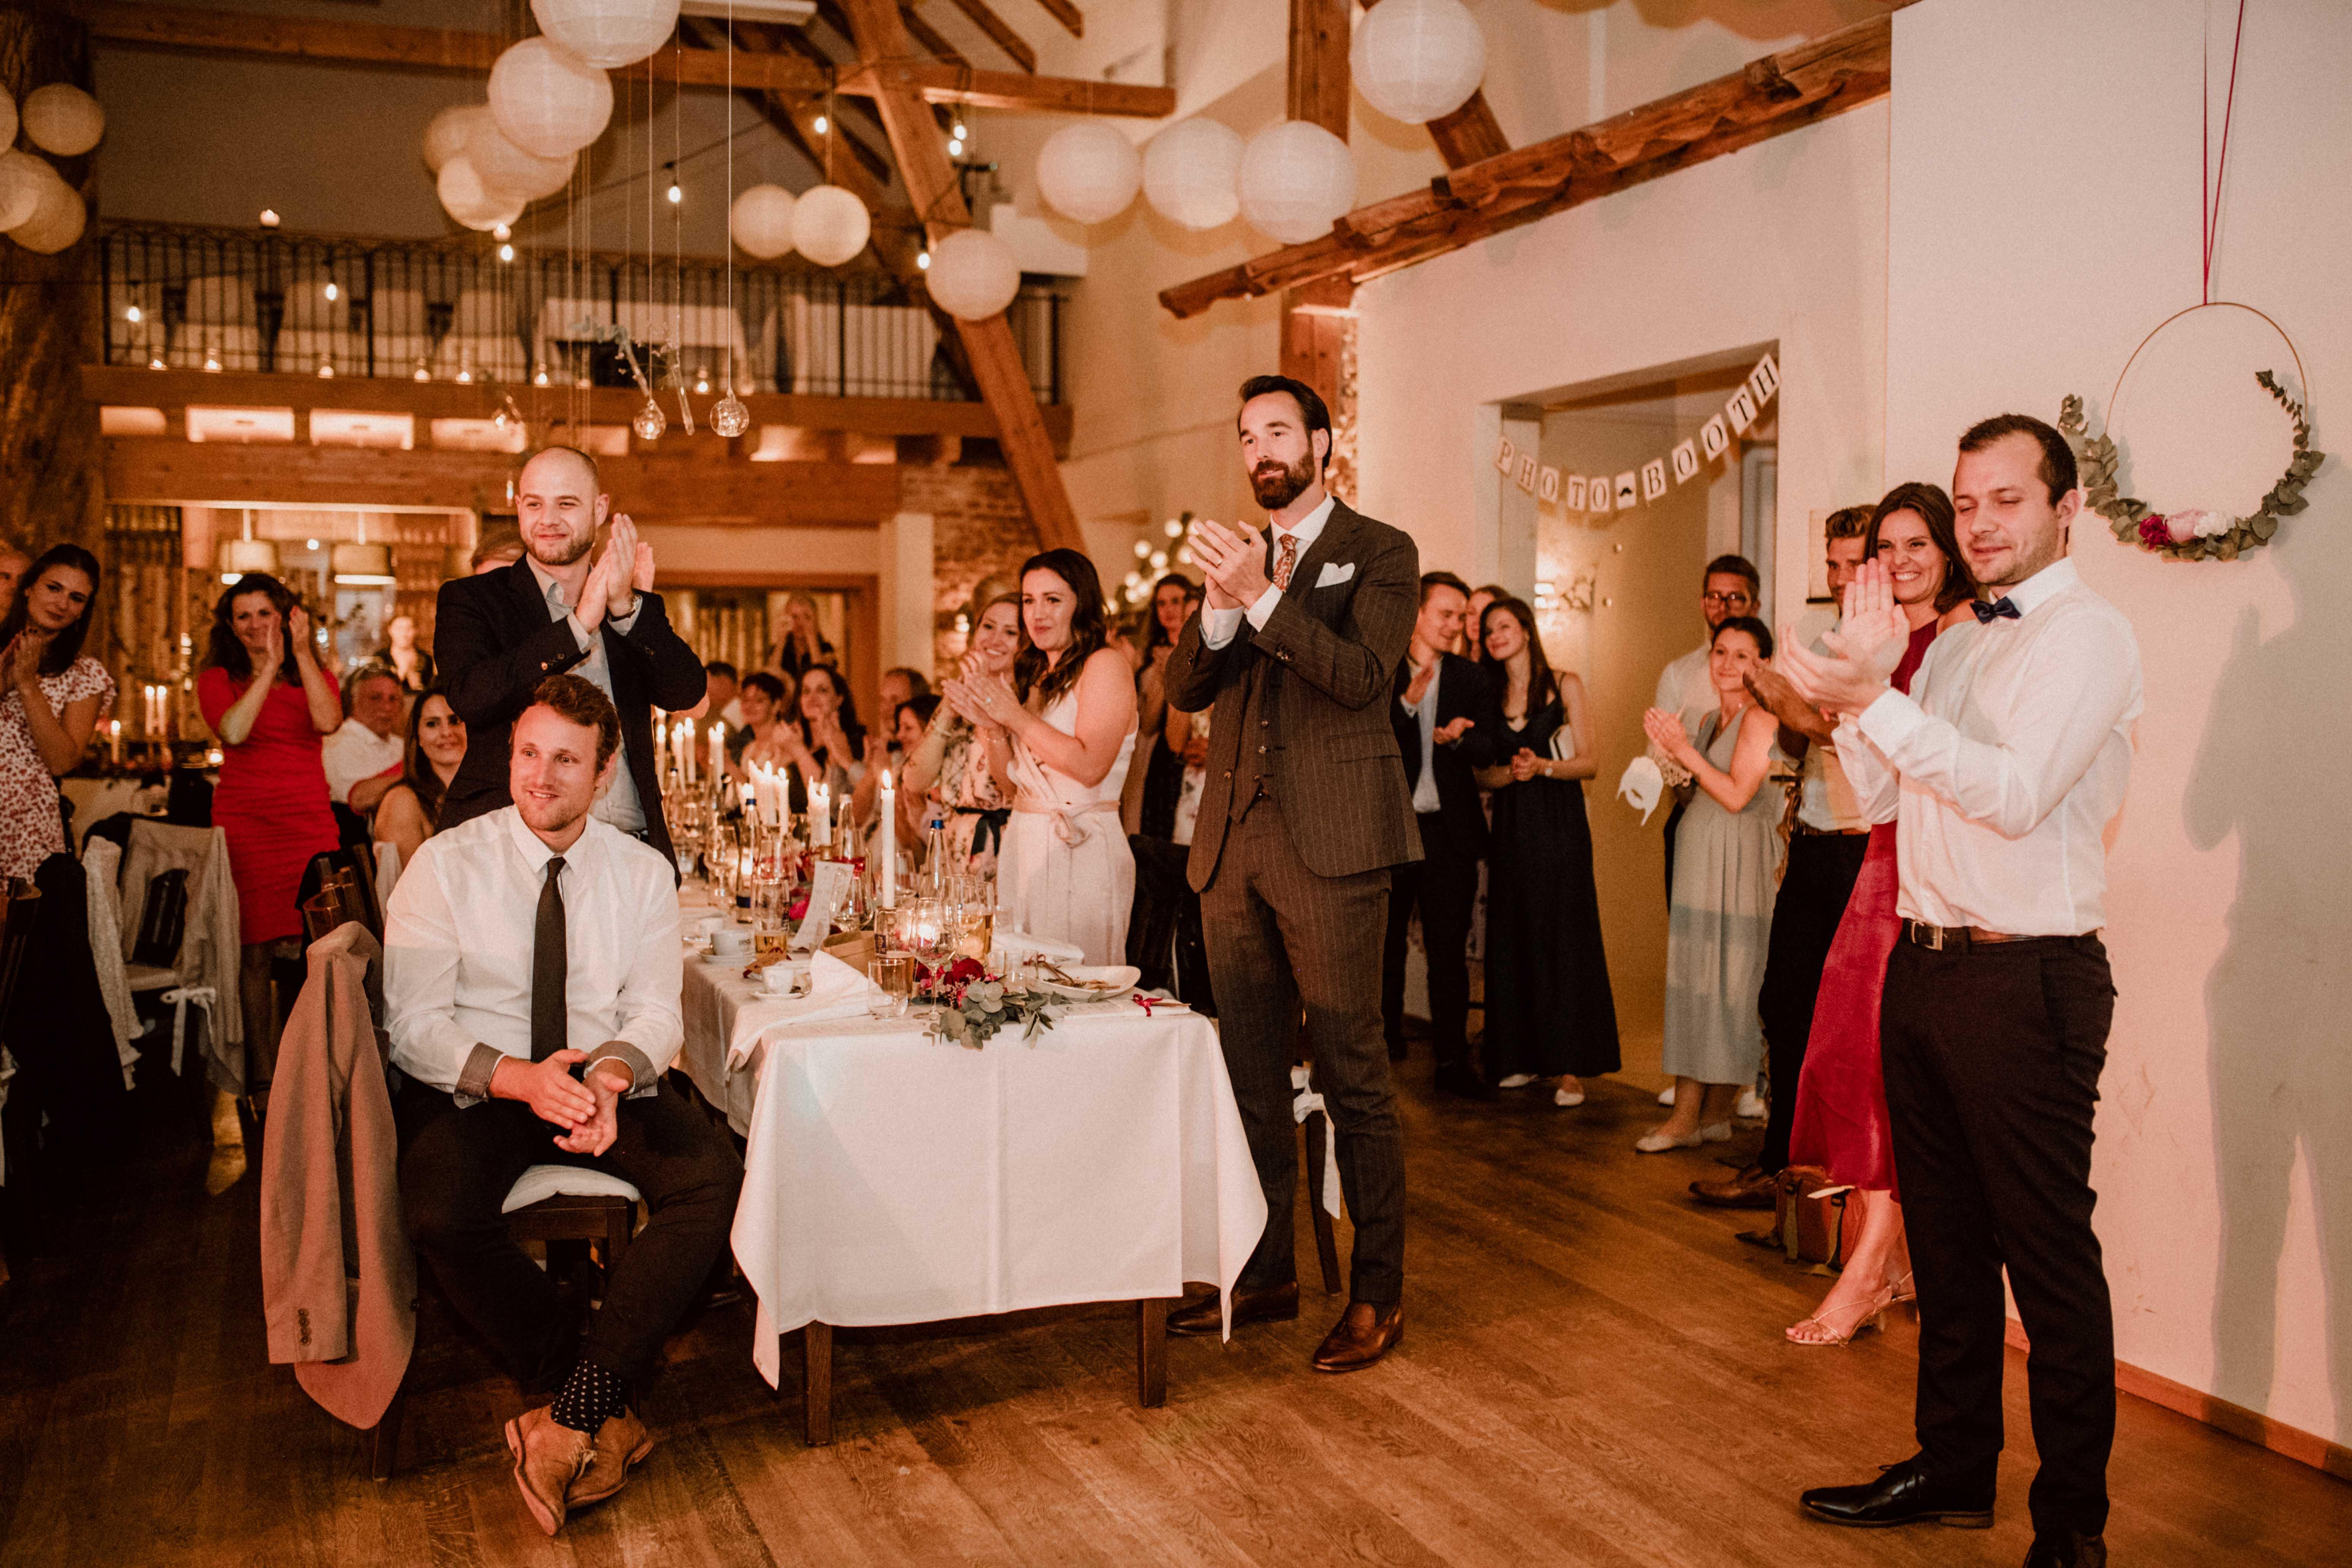 standing ovations sonja poehlmann photography wedding muenchen bayern